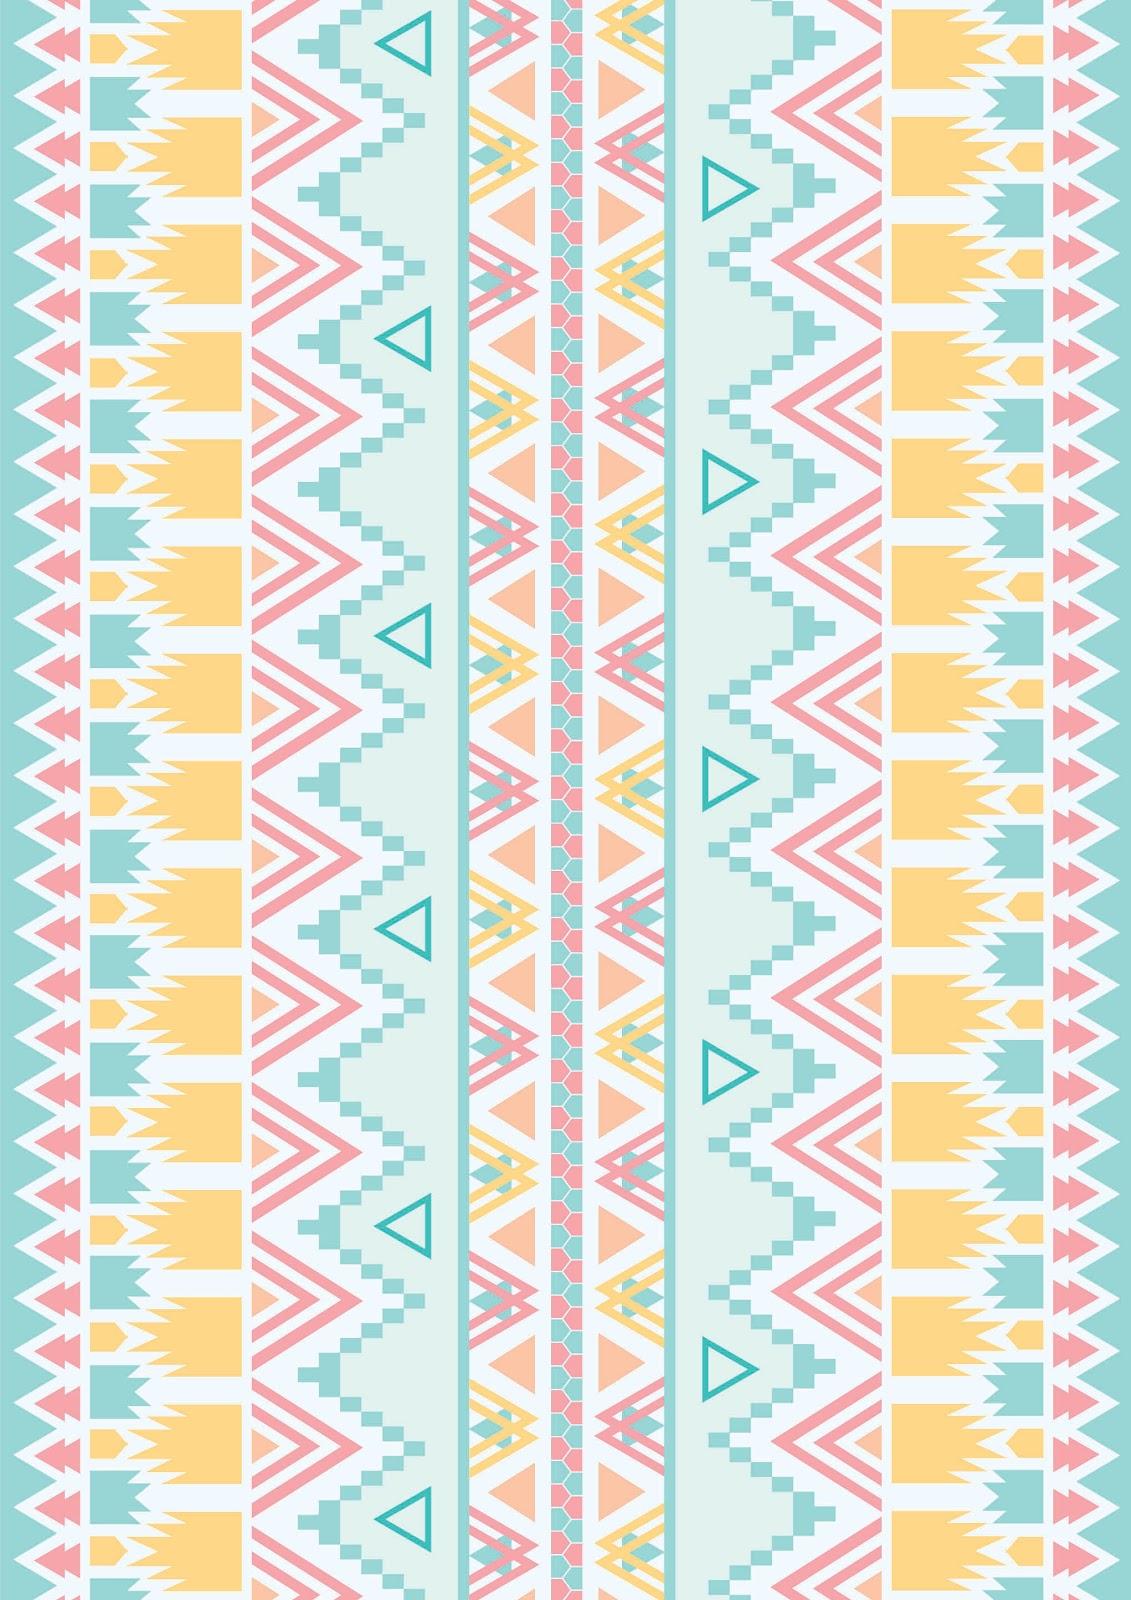 aztec pattern tumblr themes - photo #33